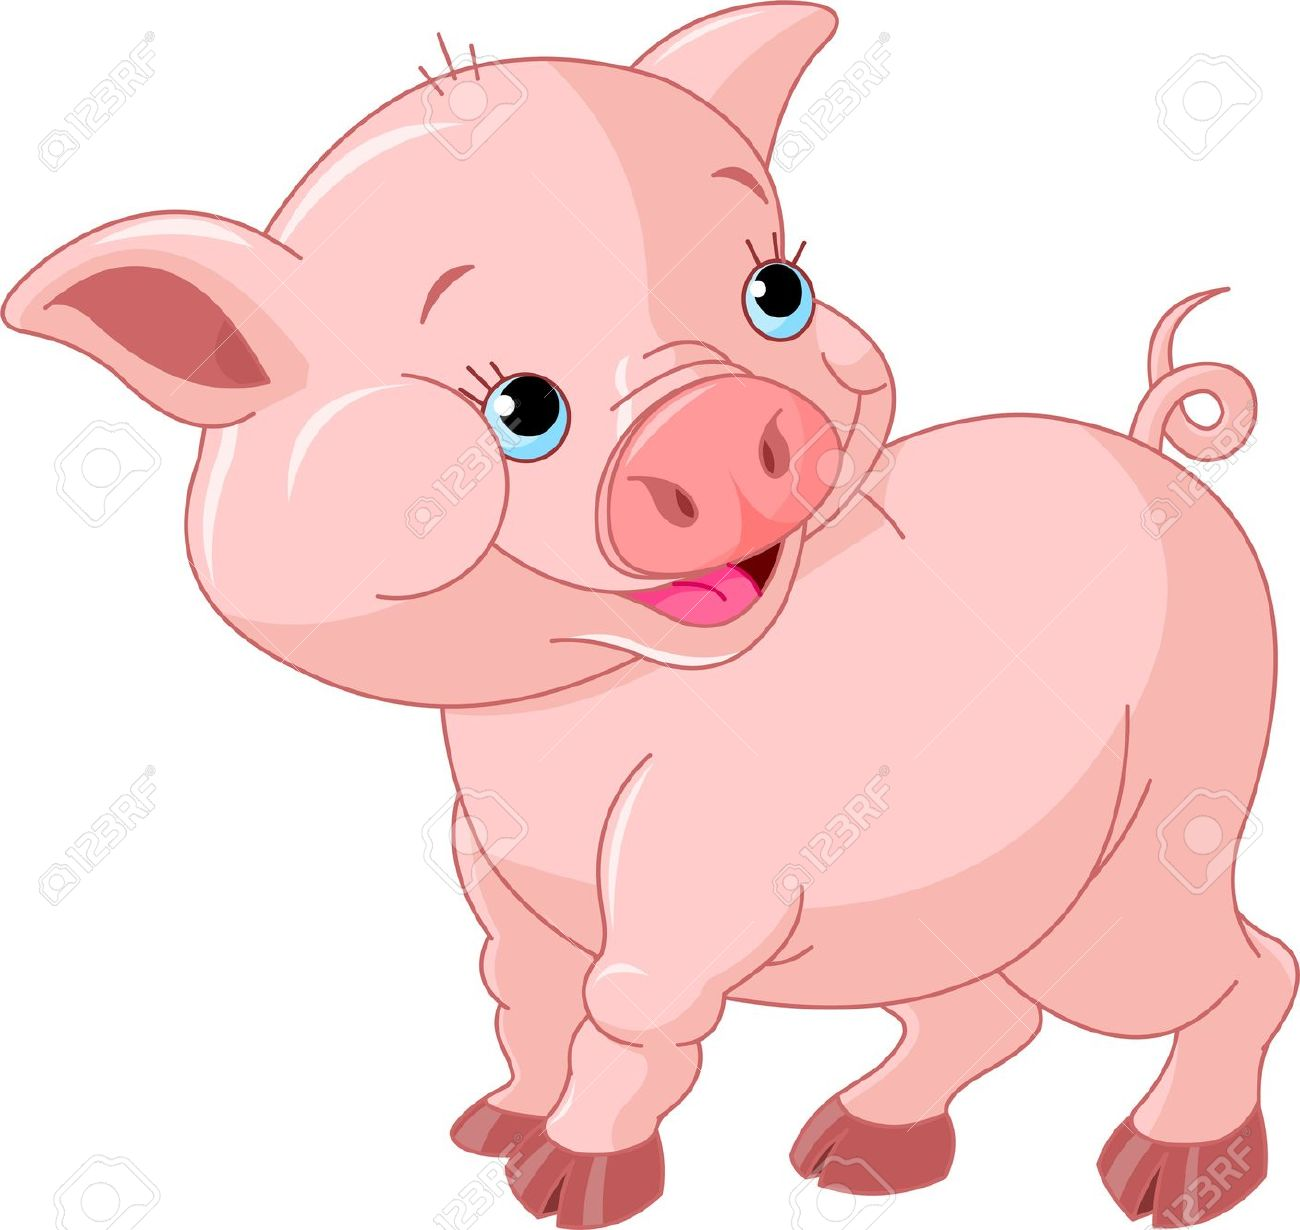 pig clip art cartoon clipart panda free clipart images rh clipartpanda com cartoon pig clipart free Pig Baby Shower